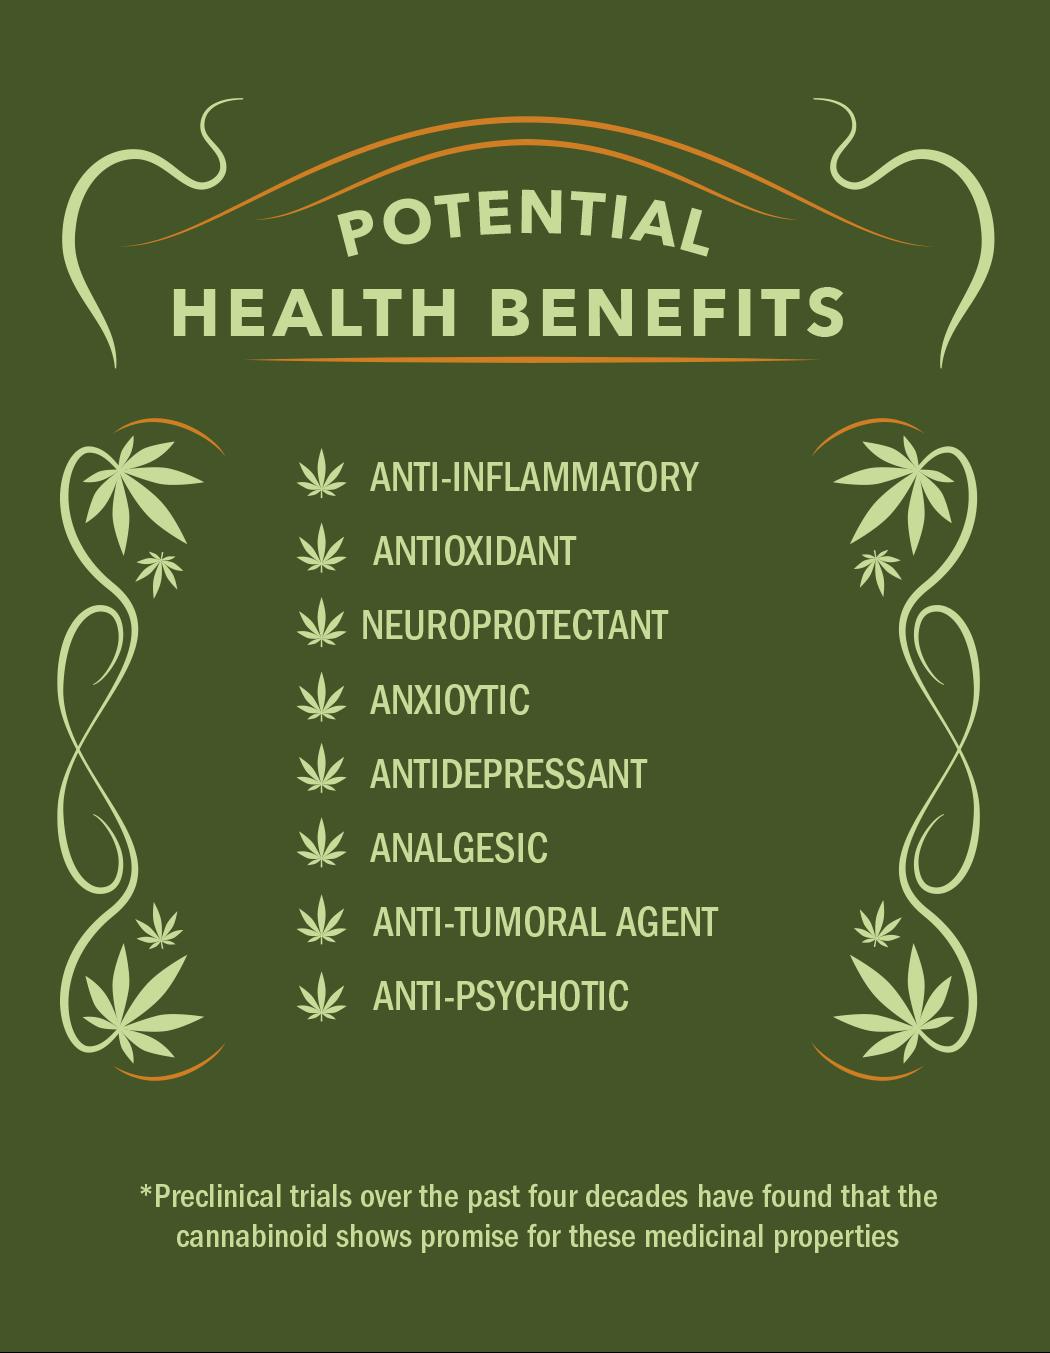 Potential Health Benefits